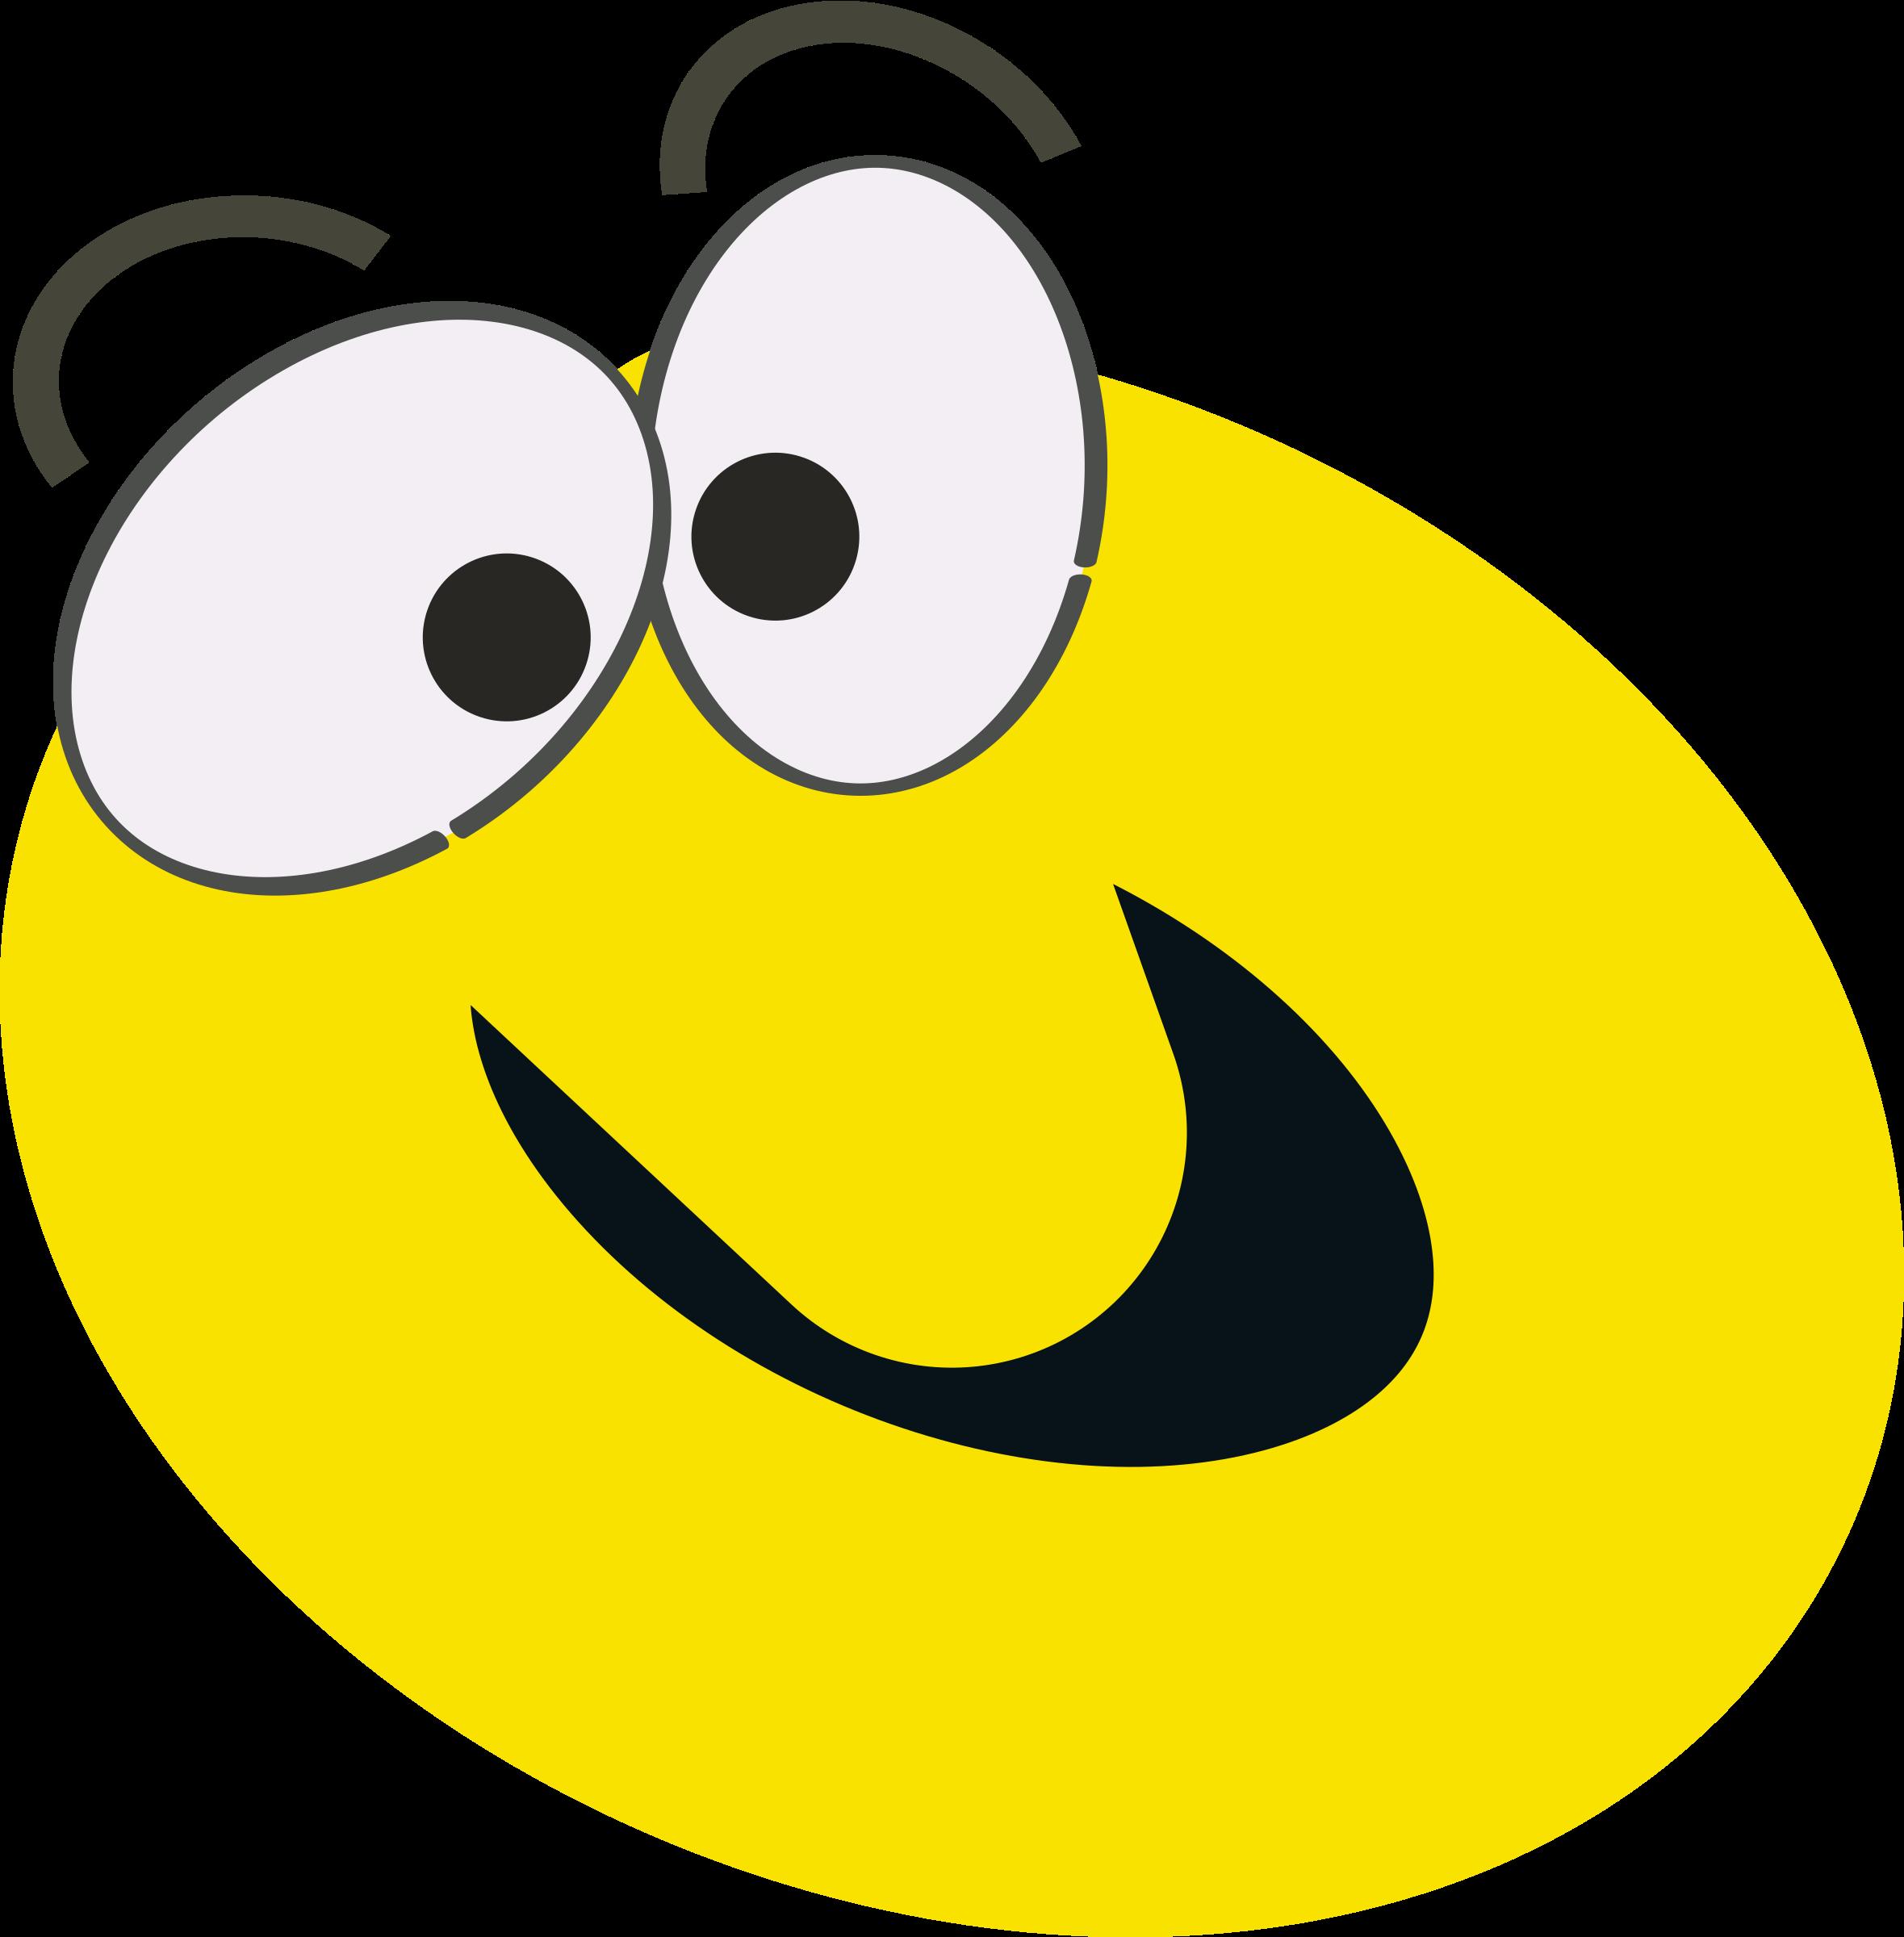 Cartoon face big image. Smiley clipart animation